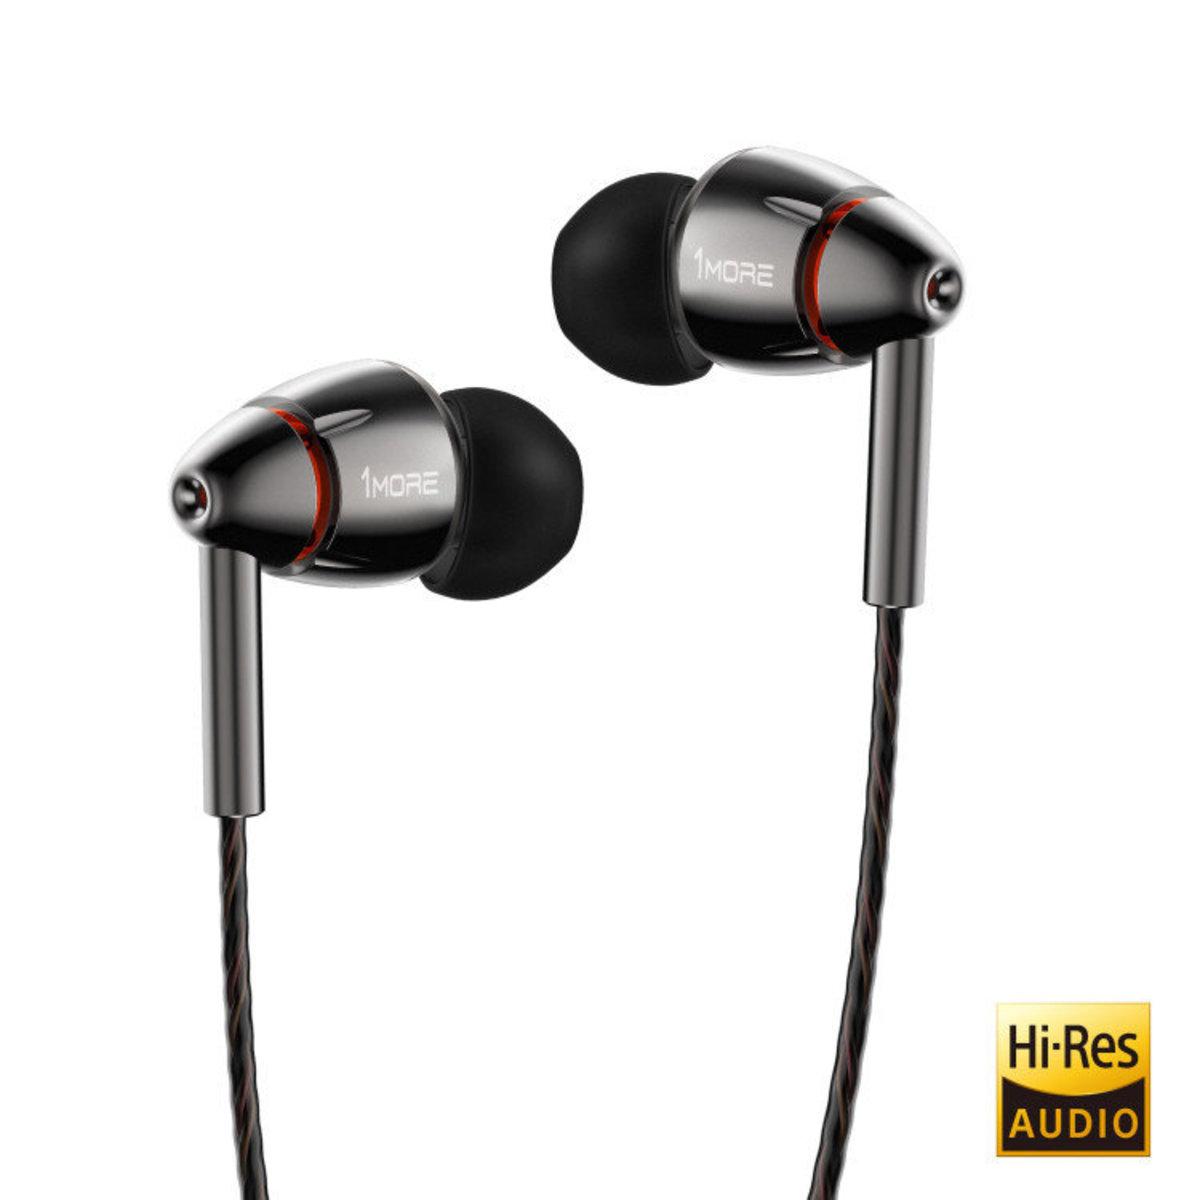 E1010 Quad -Driver In-Ear Headphones